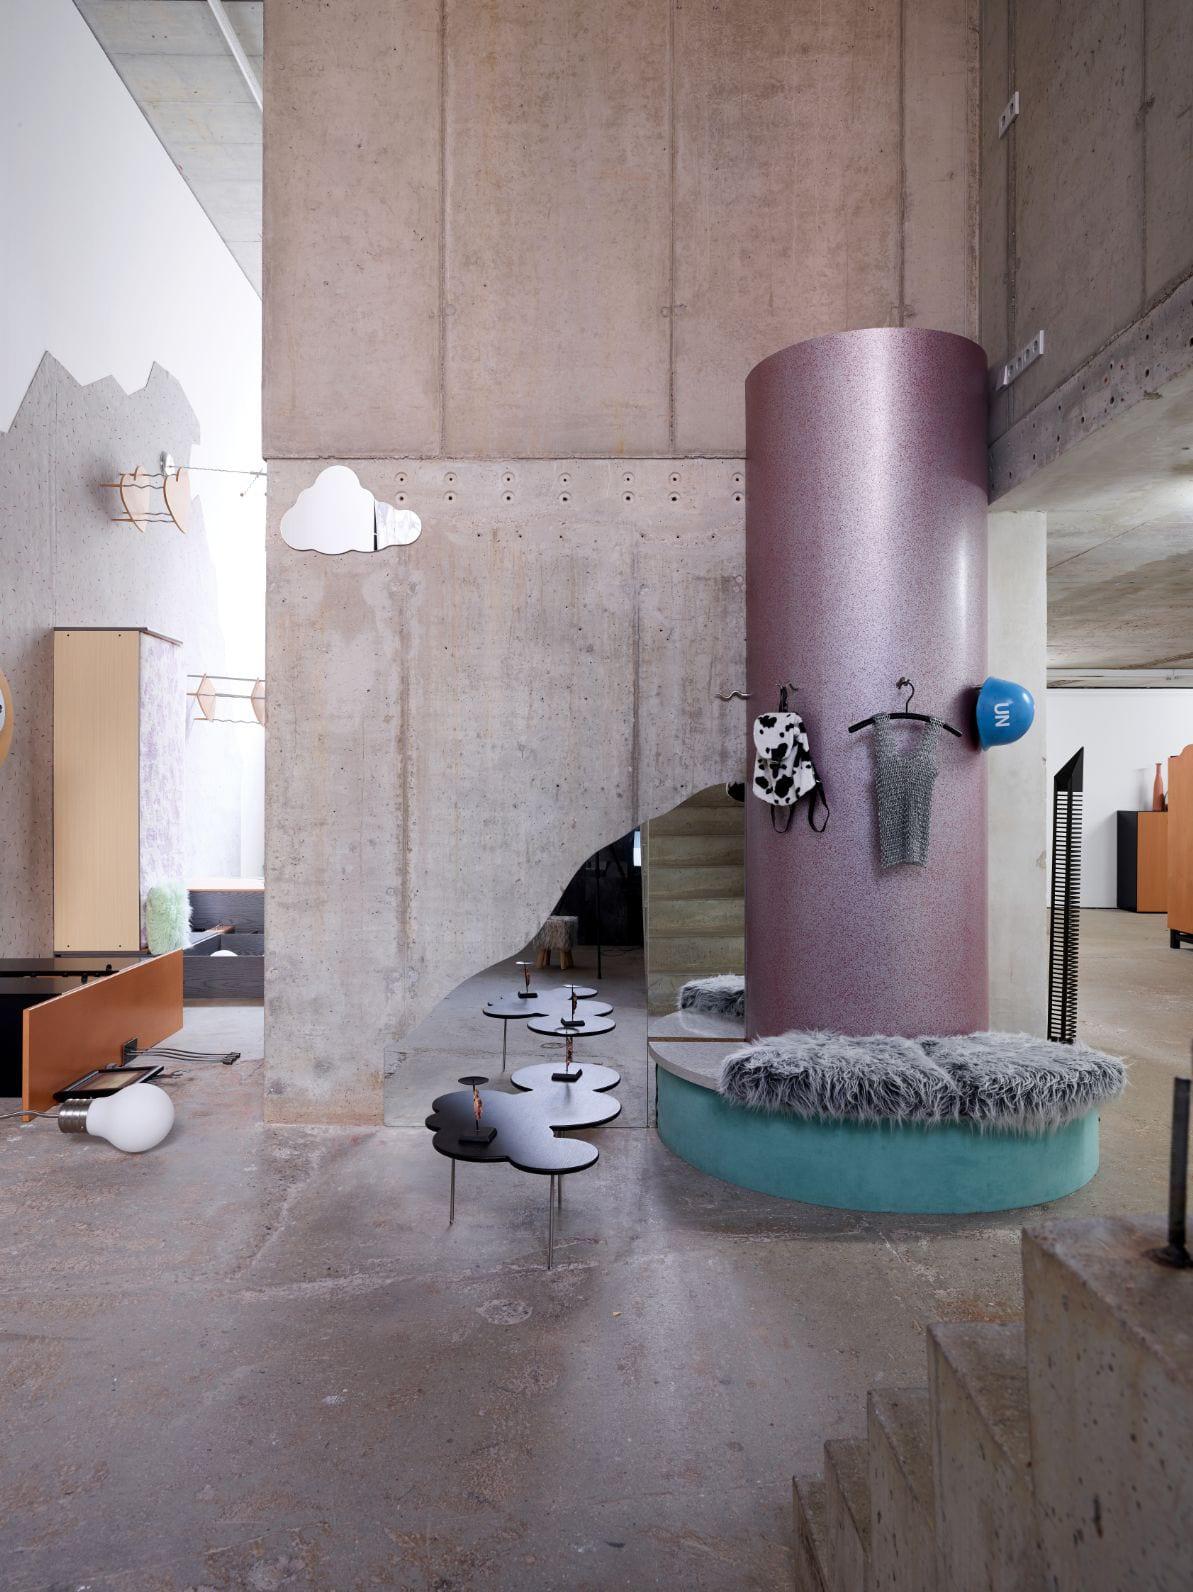 Henrike Naumann's Upside-Down Installation in Berlin | Yellowtrace